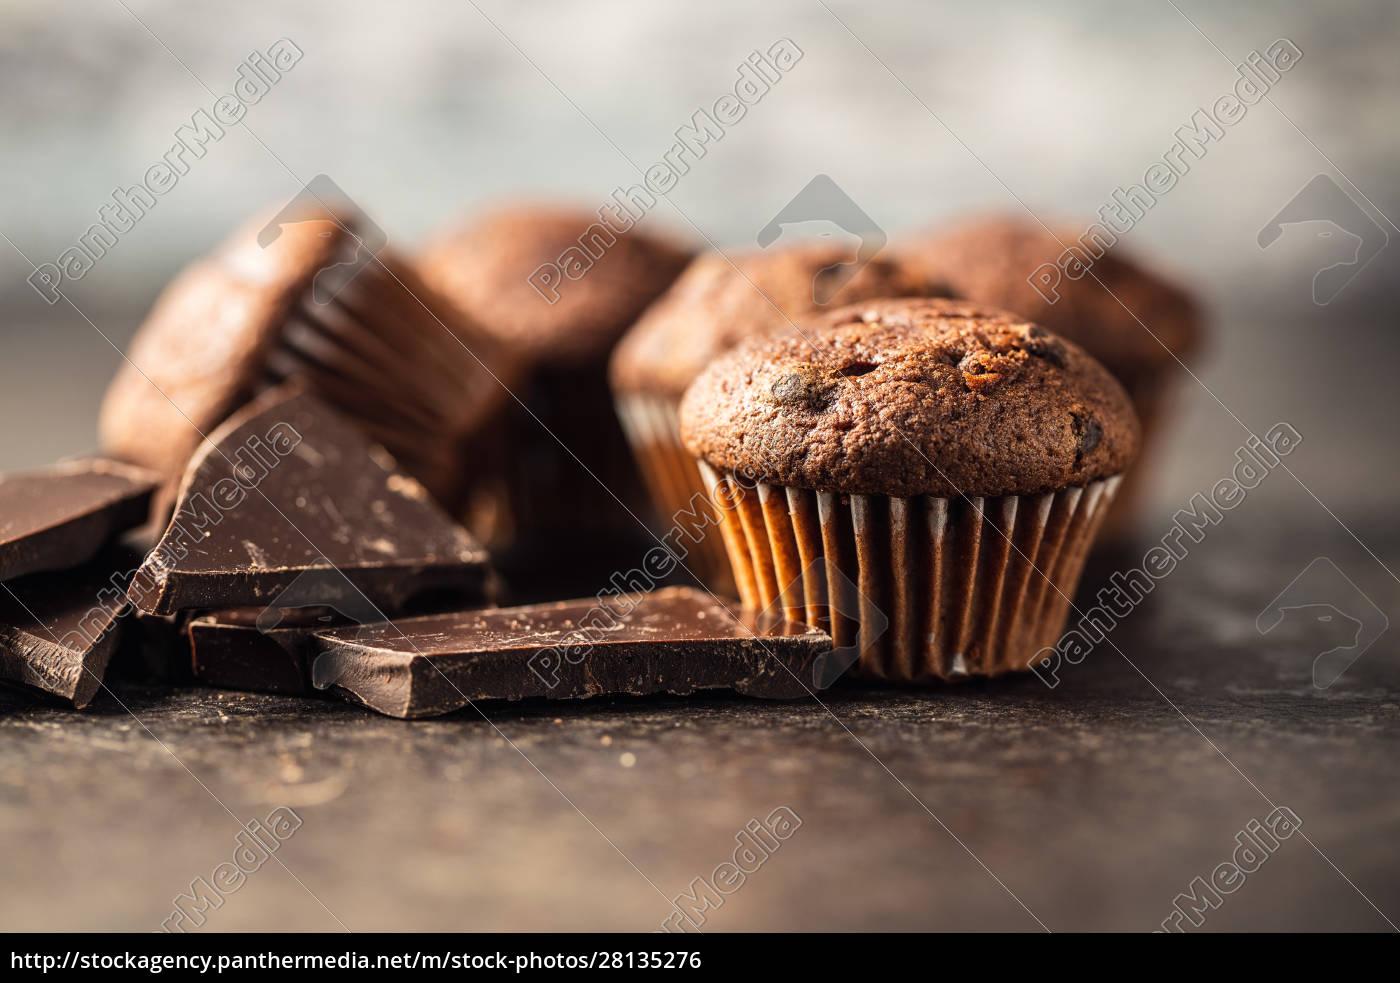 sabrosas, magdalenas, de, chocolate., dulces, pastelitos. - 28135276